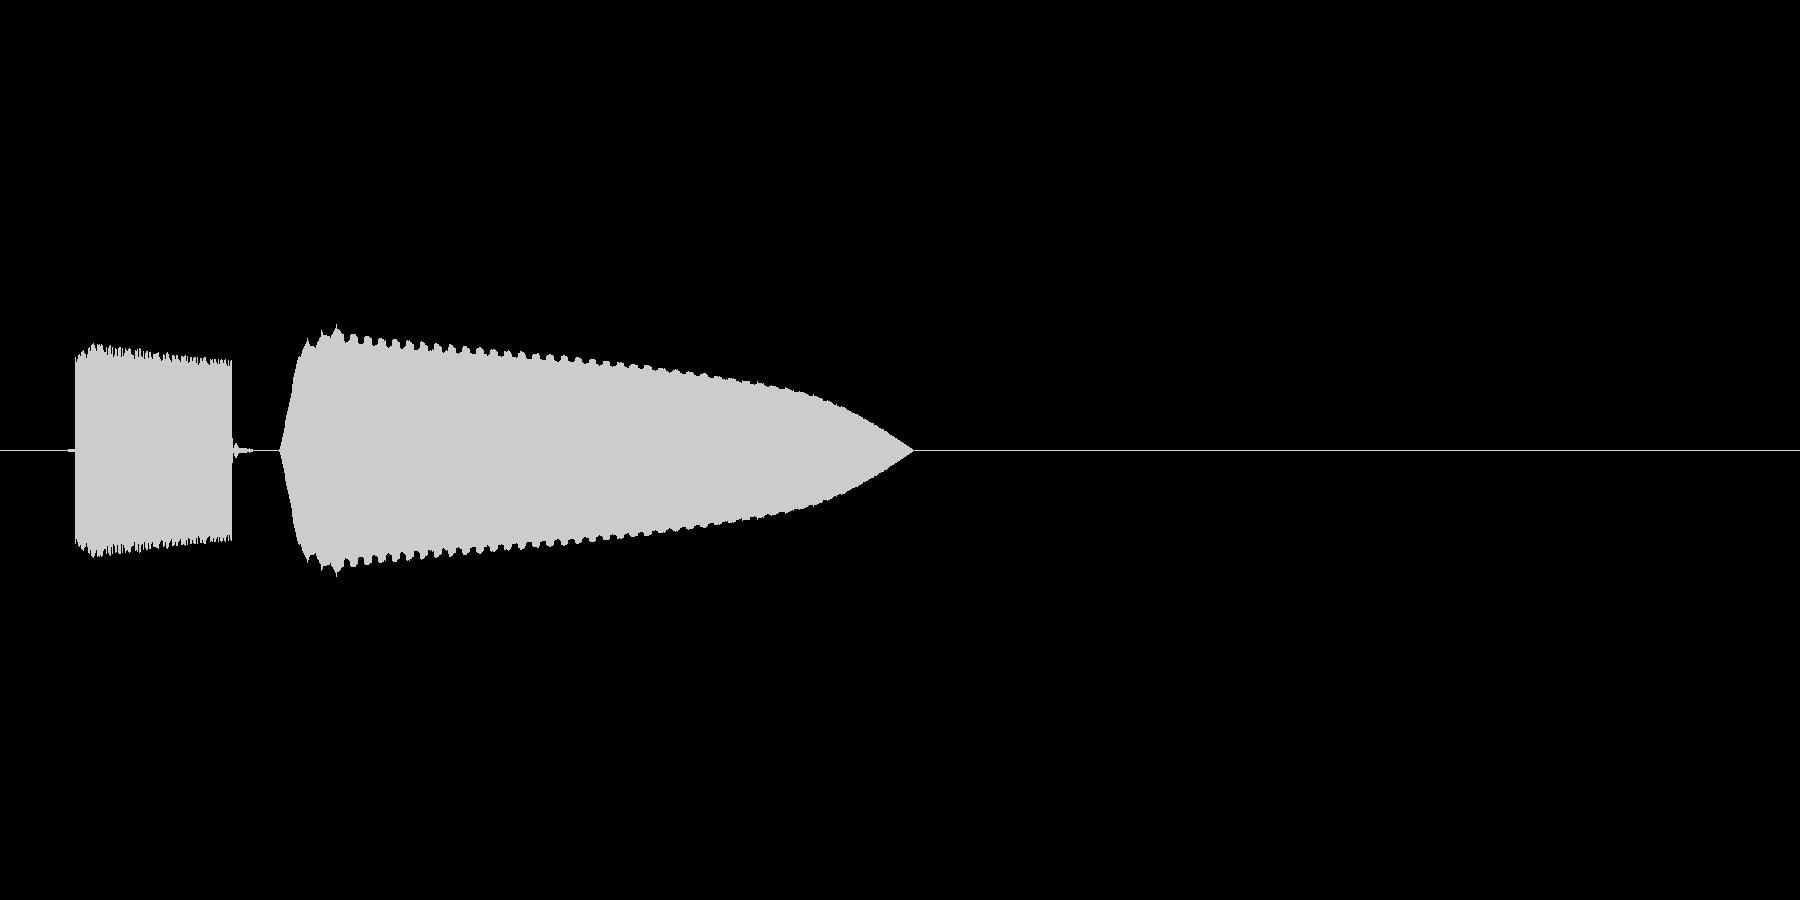 8bitの氷魔法 ピキンの未再生の波形